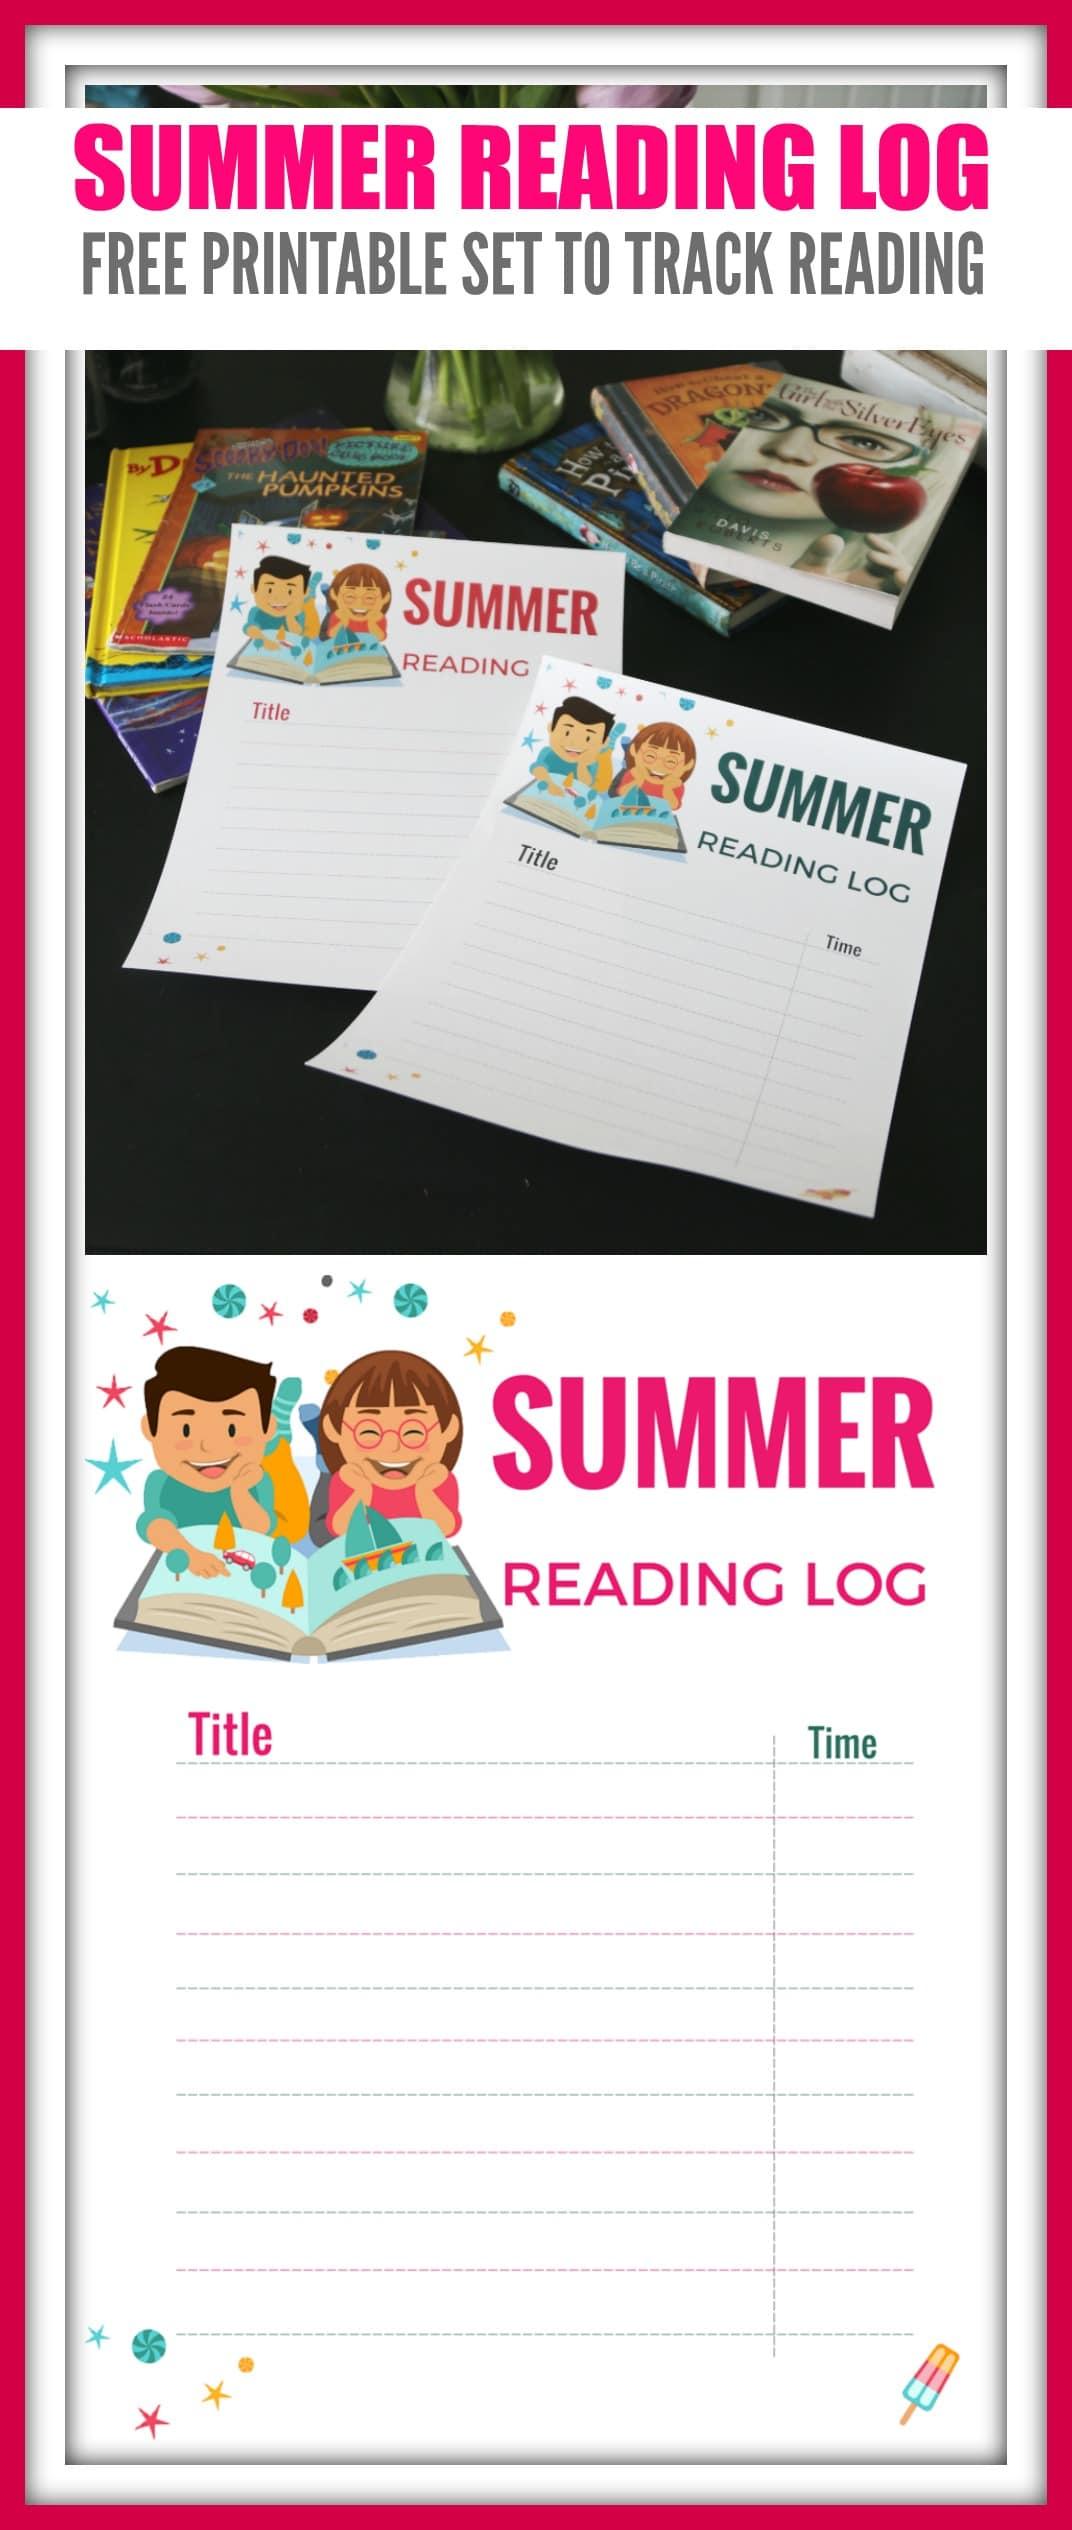 Summer Reading Log FREE PRINTABLE: Keep summer reading on track with this free printable, kids will love seeing their accomplishment this summer